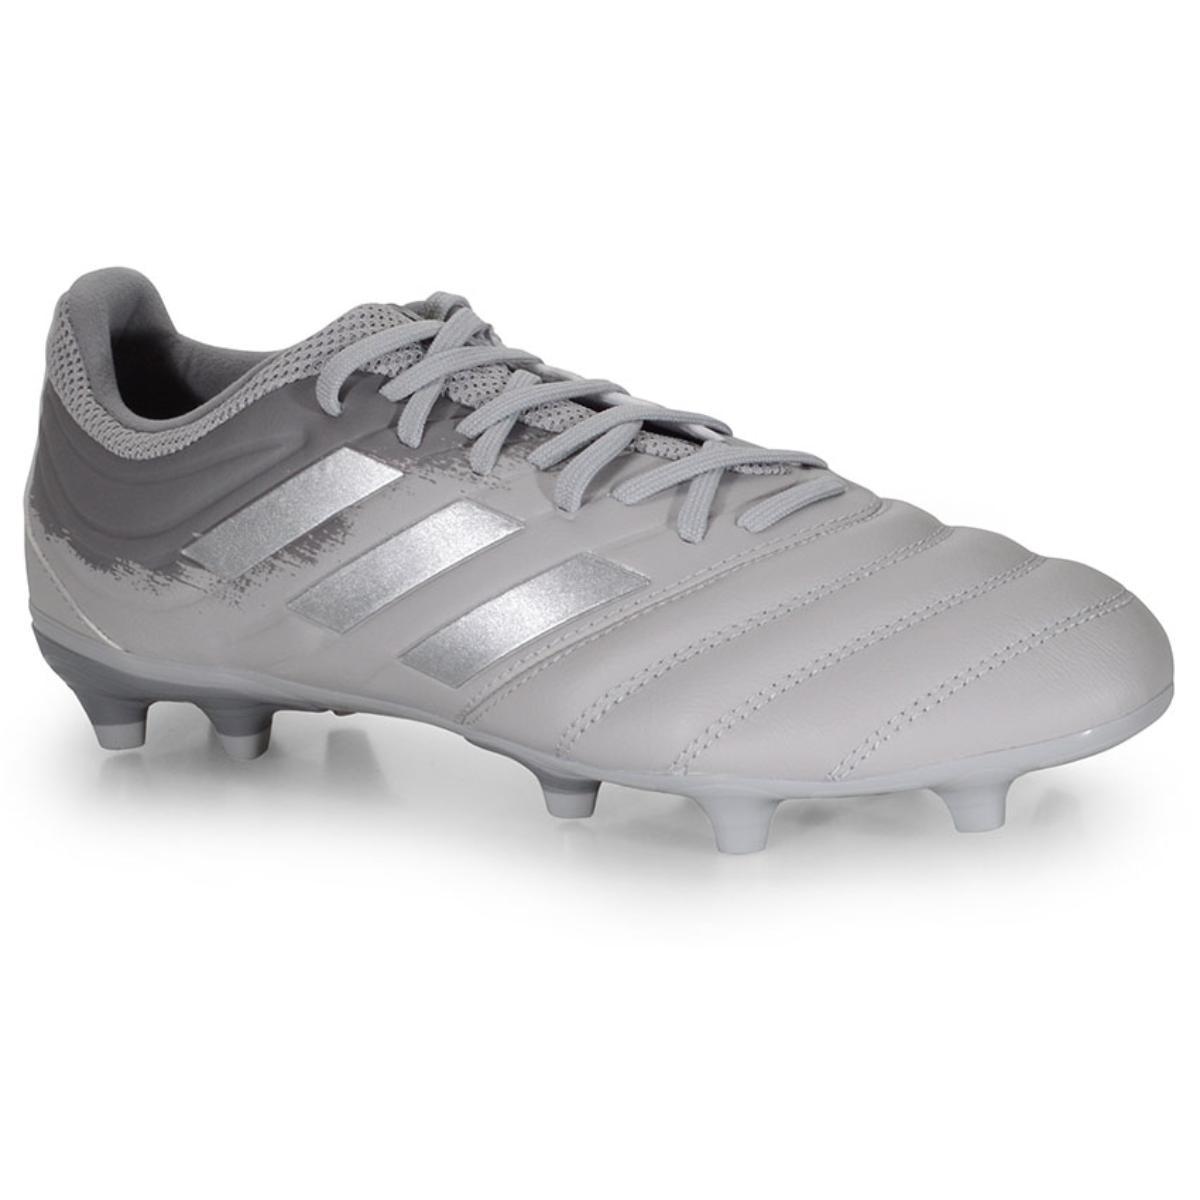 Chuteira Masculina Adidas Ef8329 Copa 20.3 fg Cinza/prata